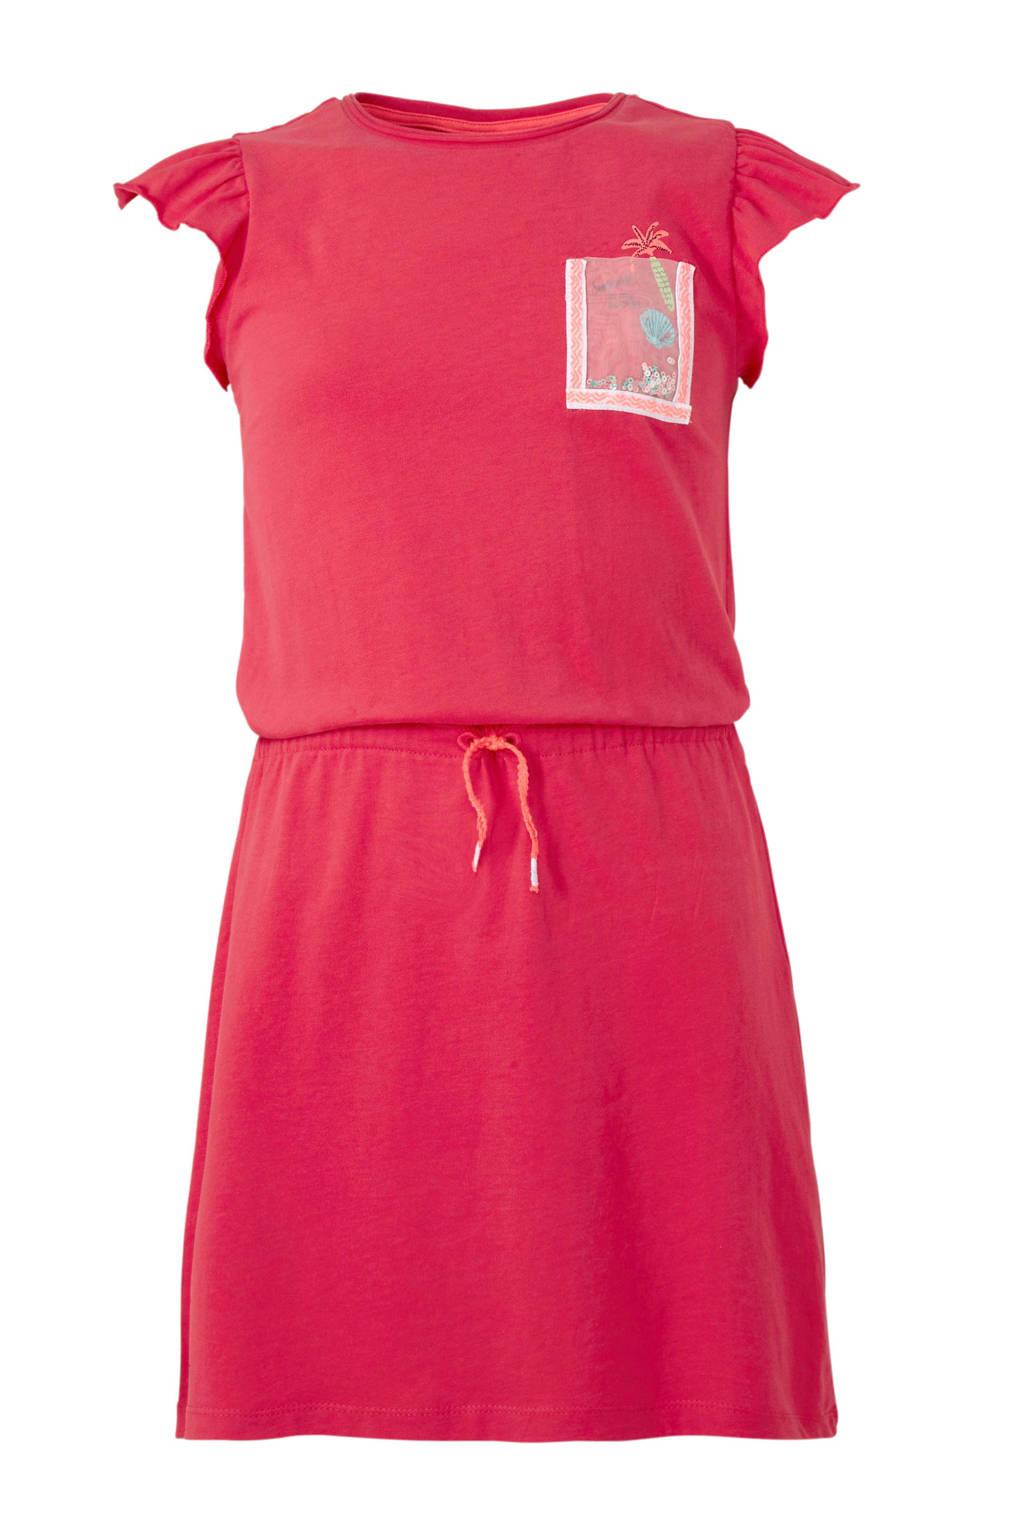 s.Oliver jurk met print roze, Roze/wit